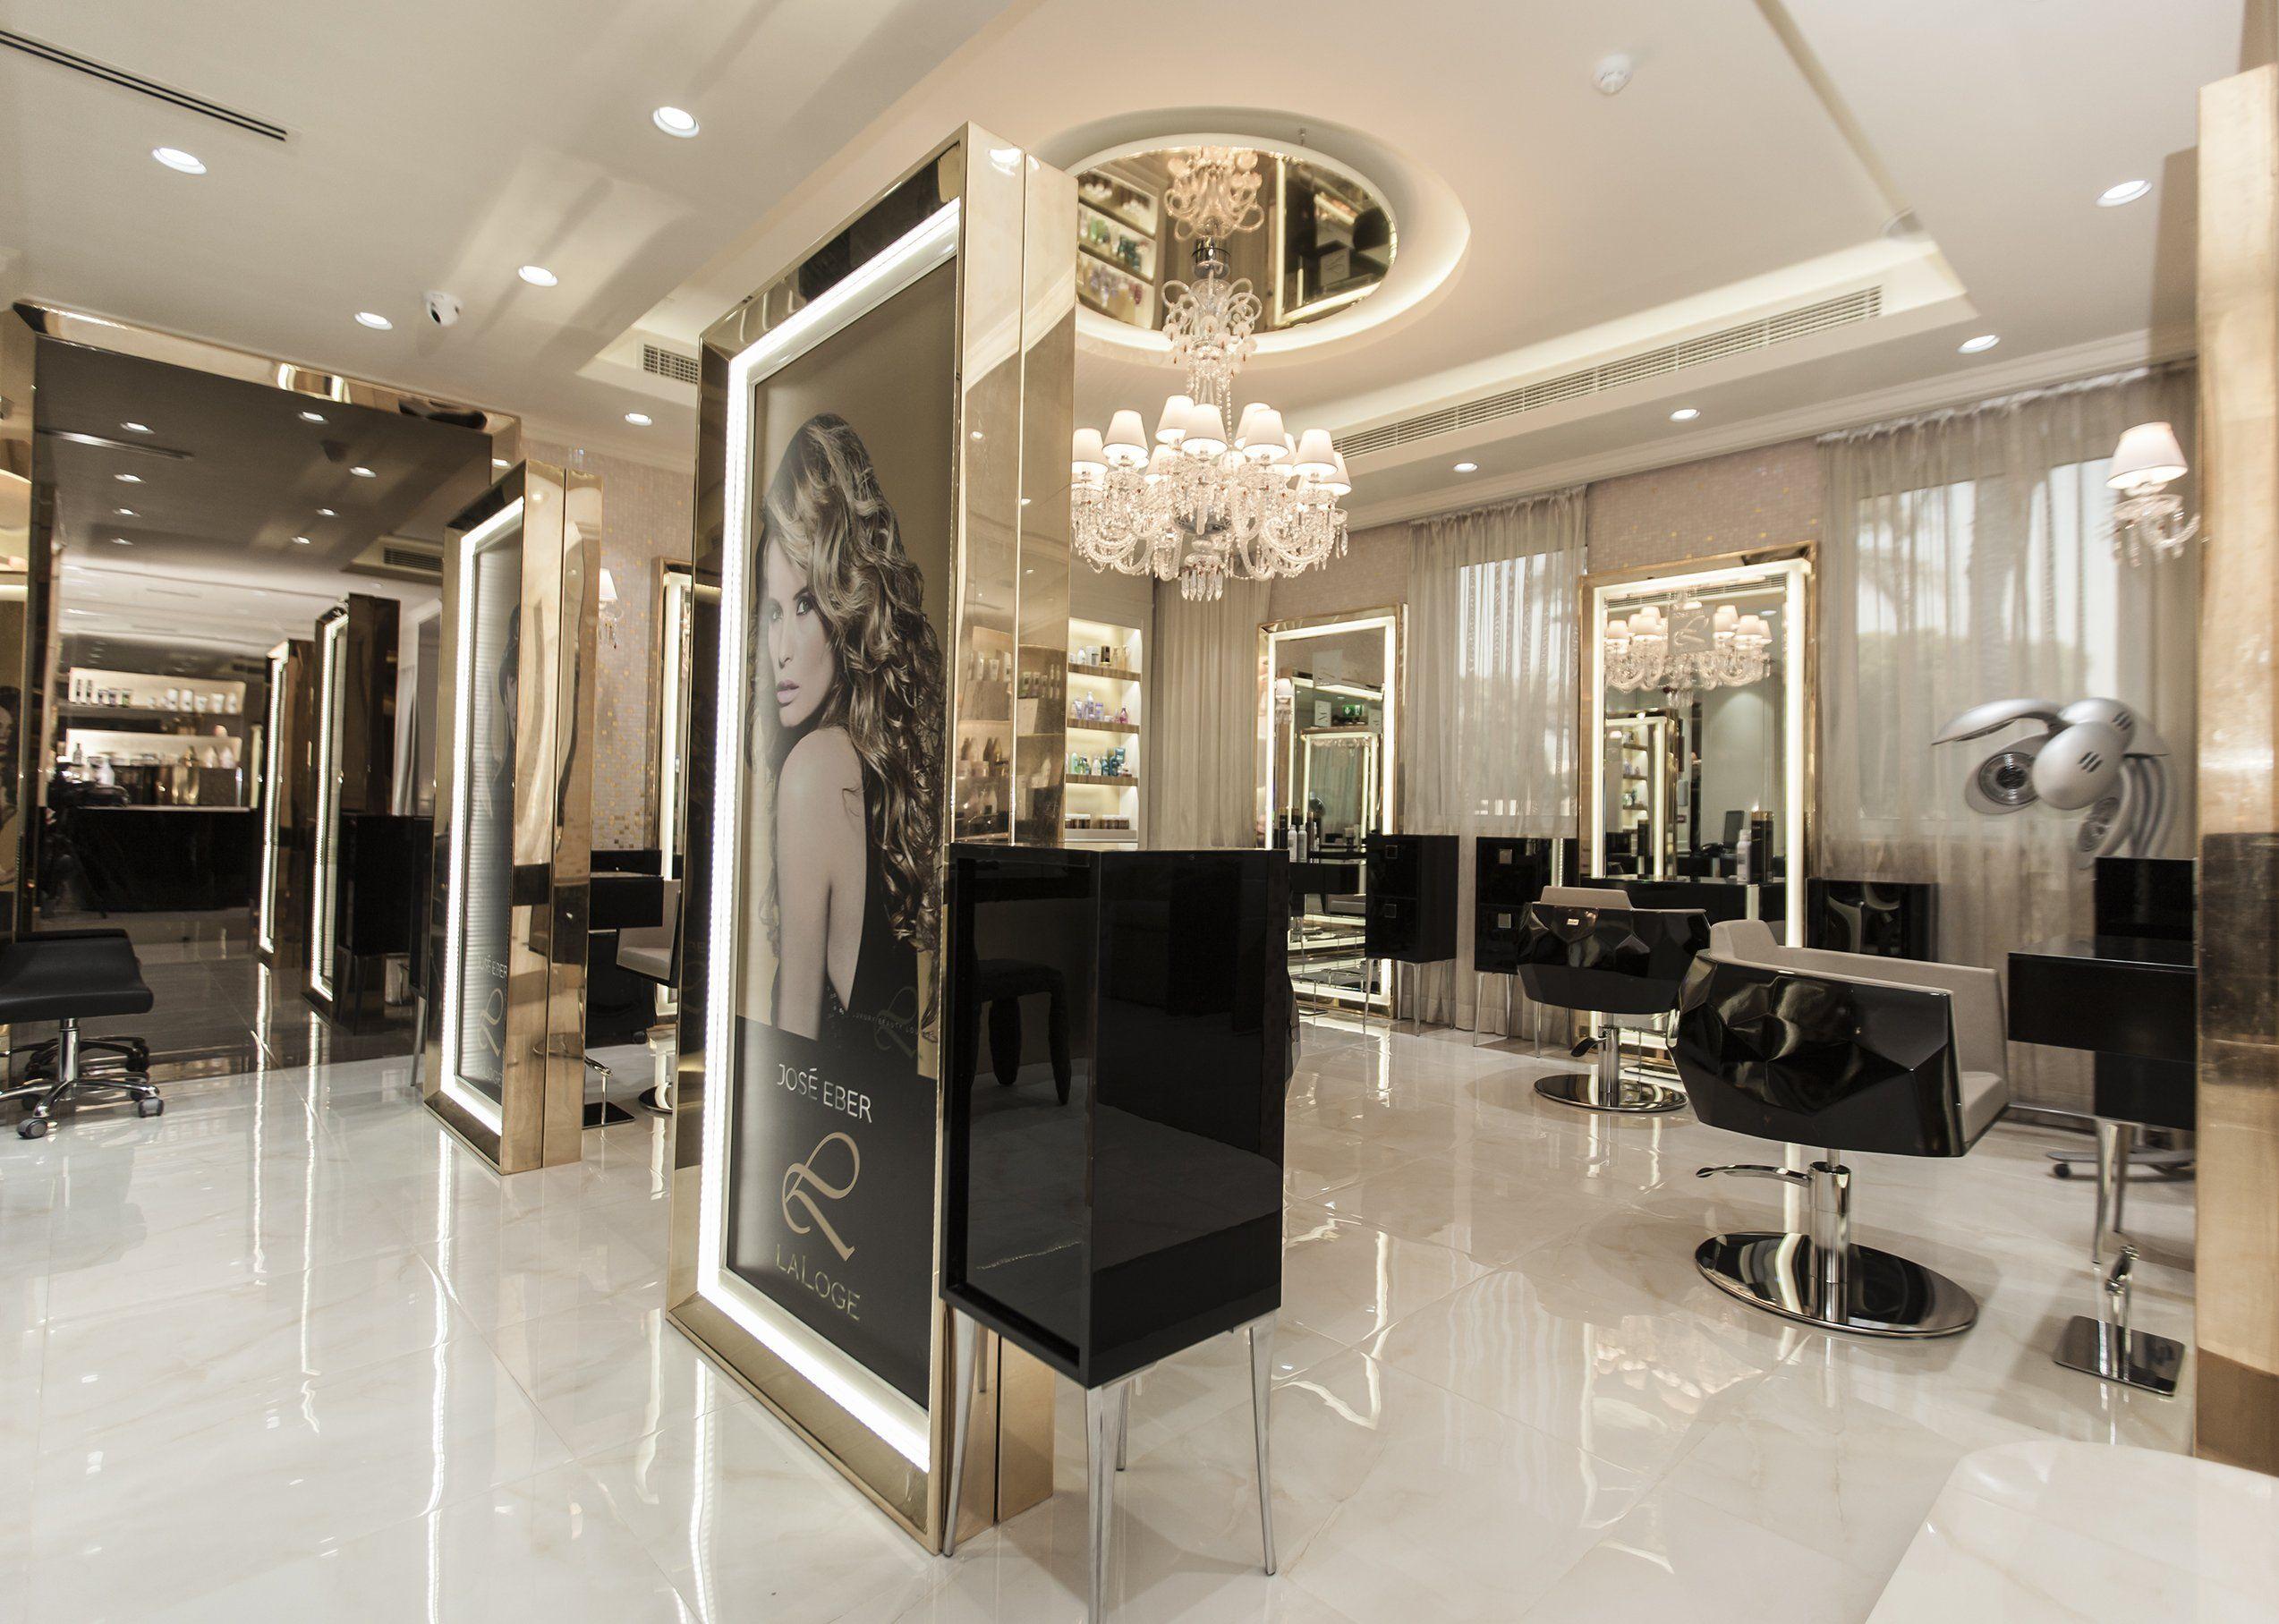 LALOGE_DUBAI_SALON_1.jpg 2,547×1,815 pixels Luxury salon